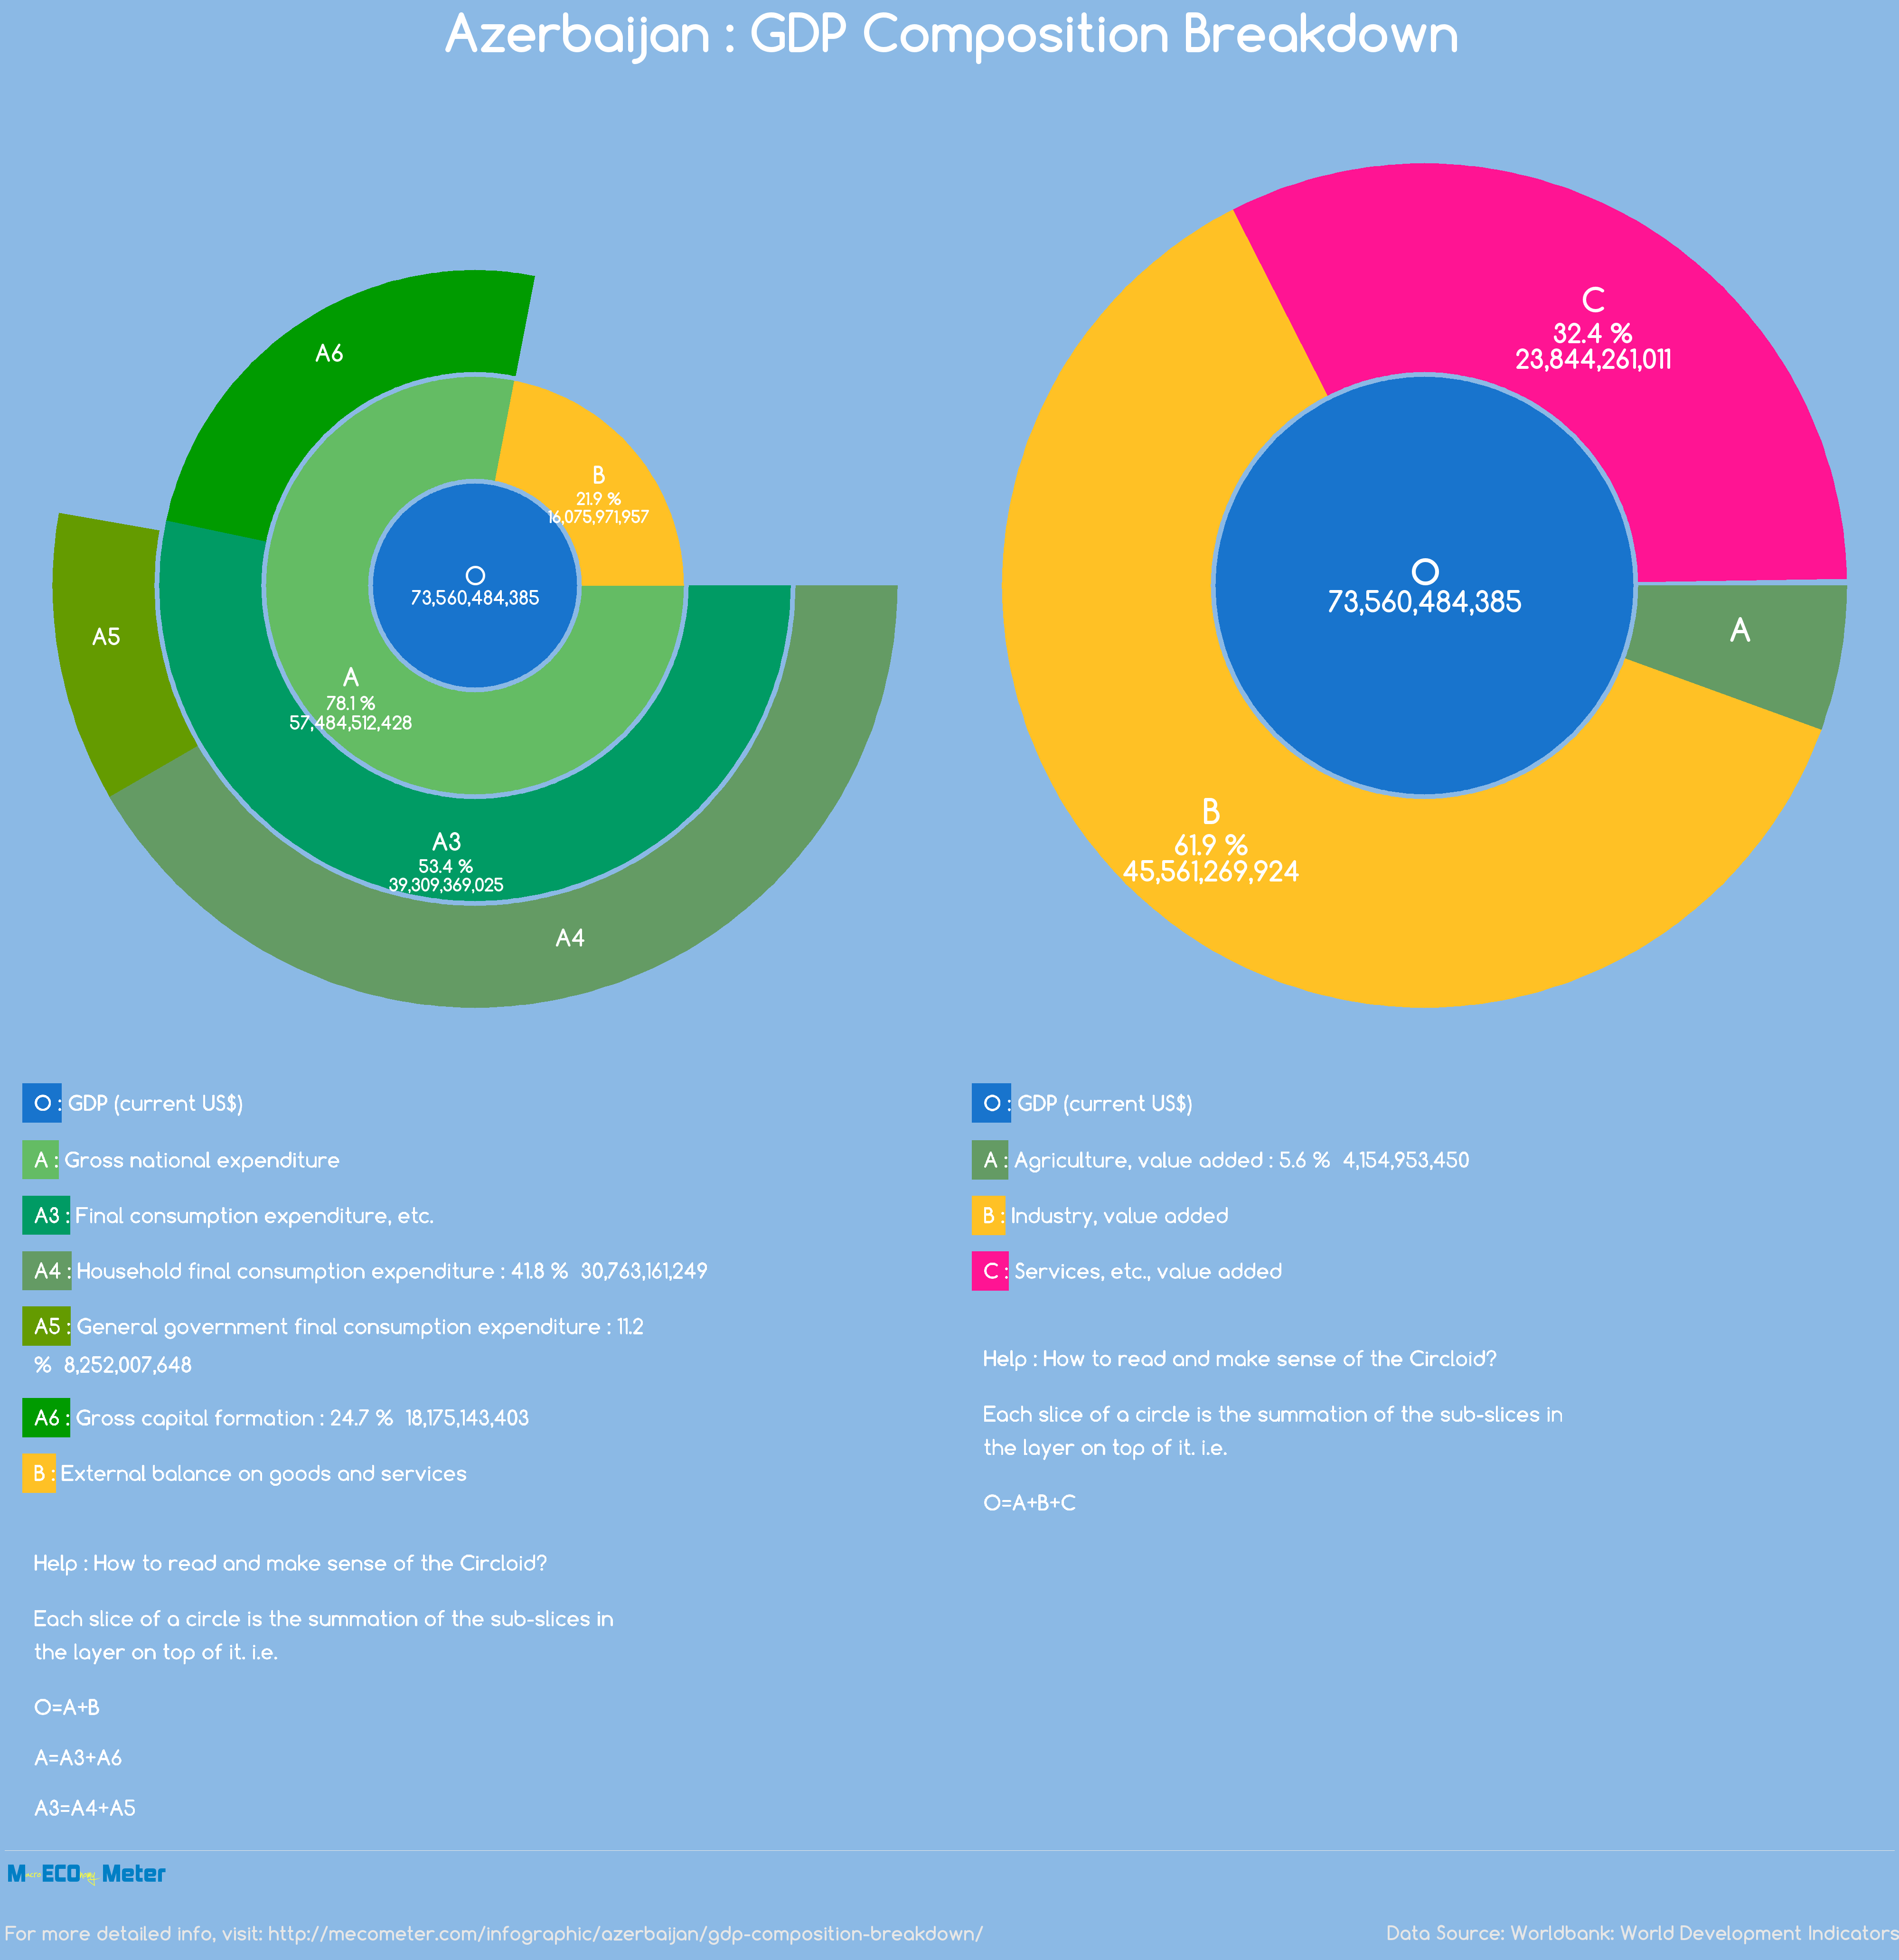 Azerbaijan : GDP Composition Breakdown